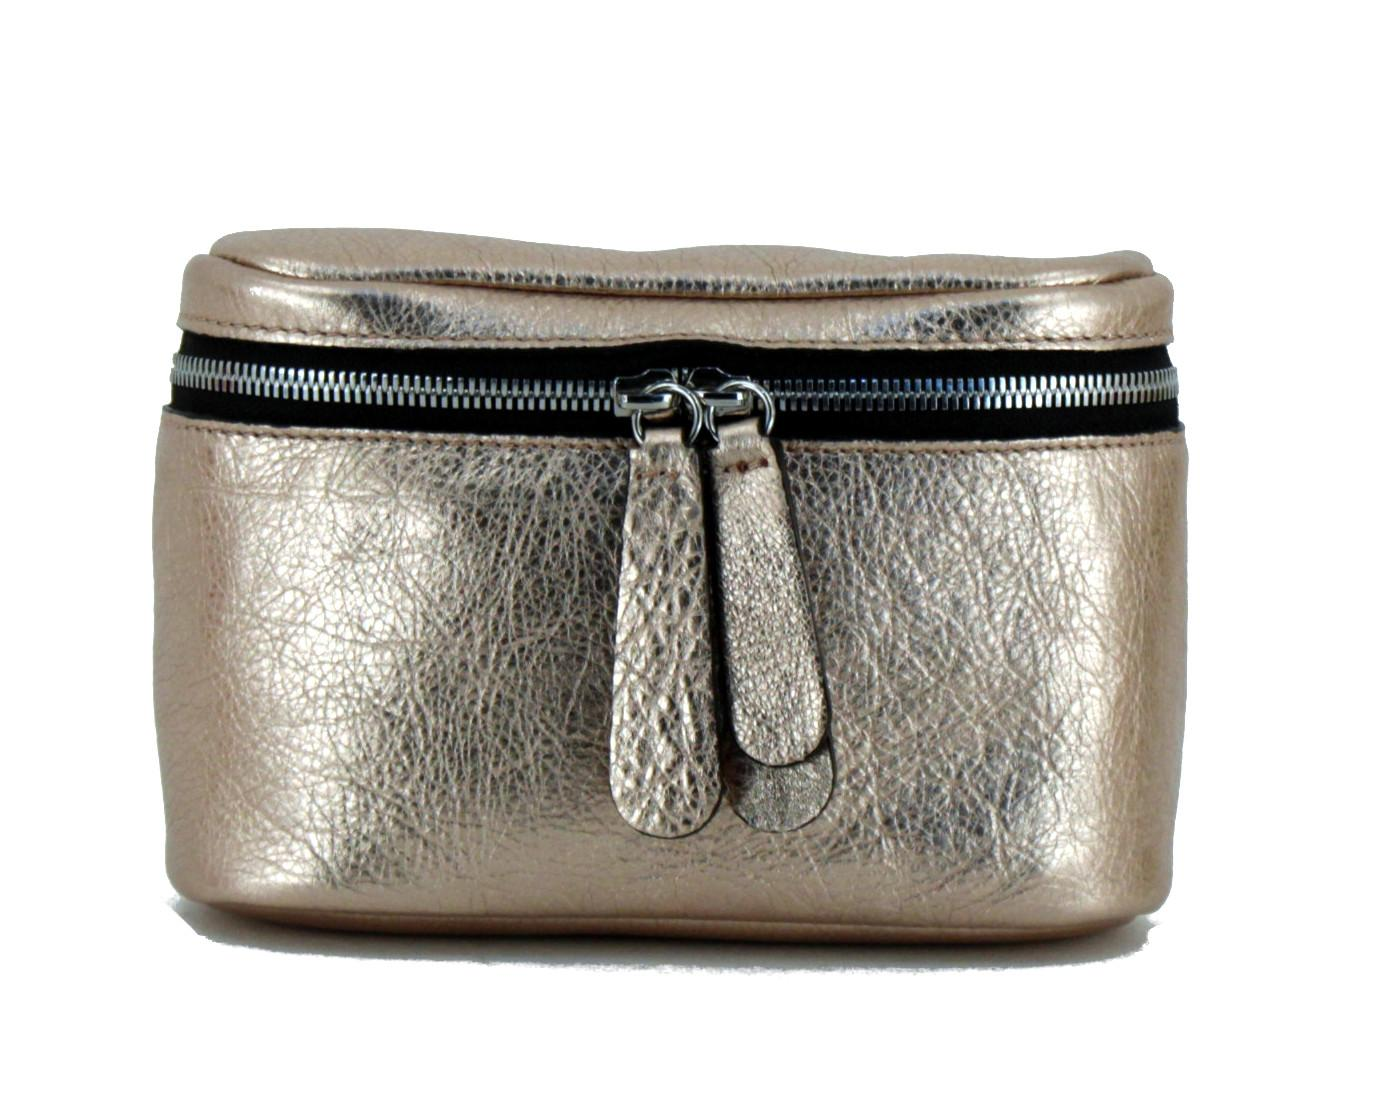 Hüfttasche Gianni Chiarini Galatea silber metallic Schultergurt